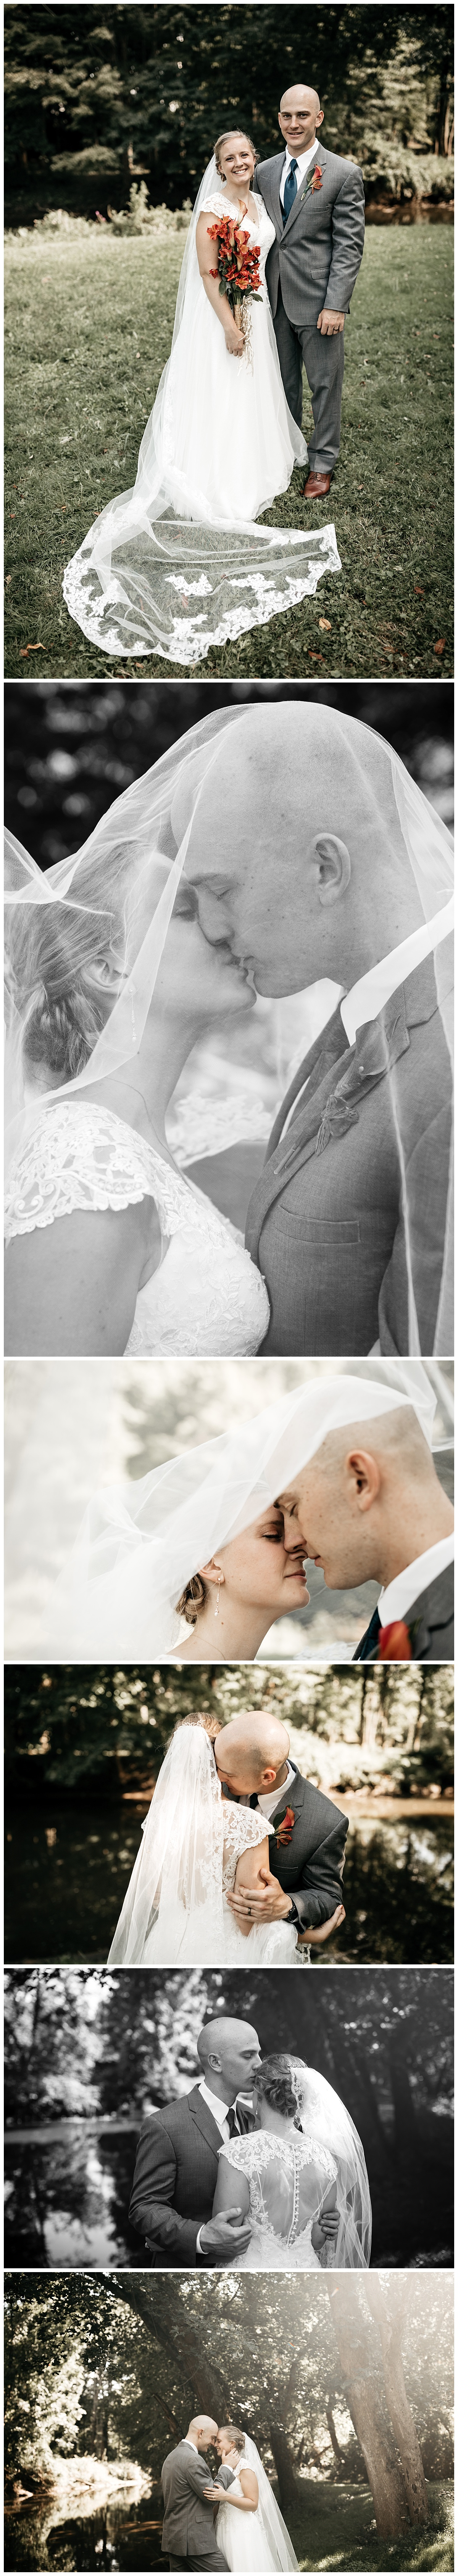 grovecitypabackyardweddingweddingphotographer_0010.jpg